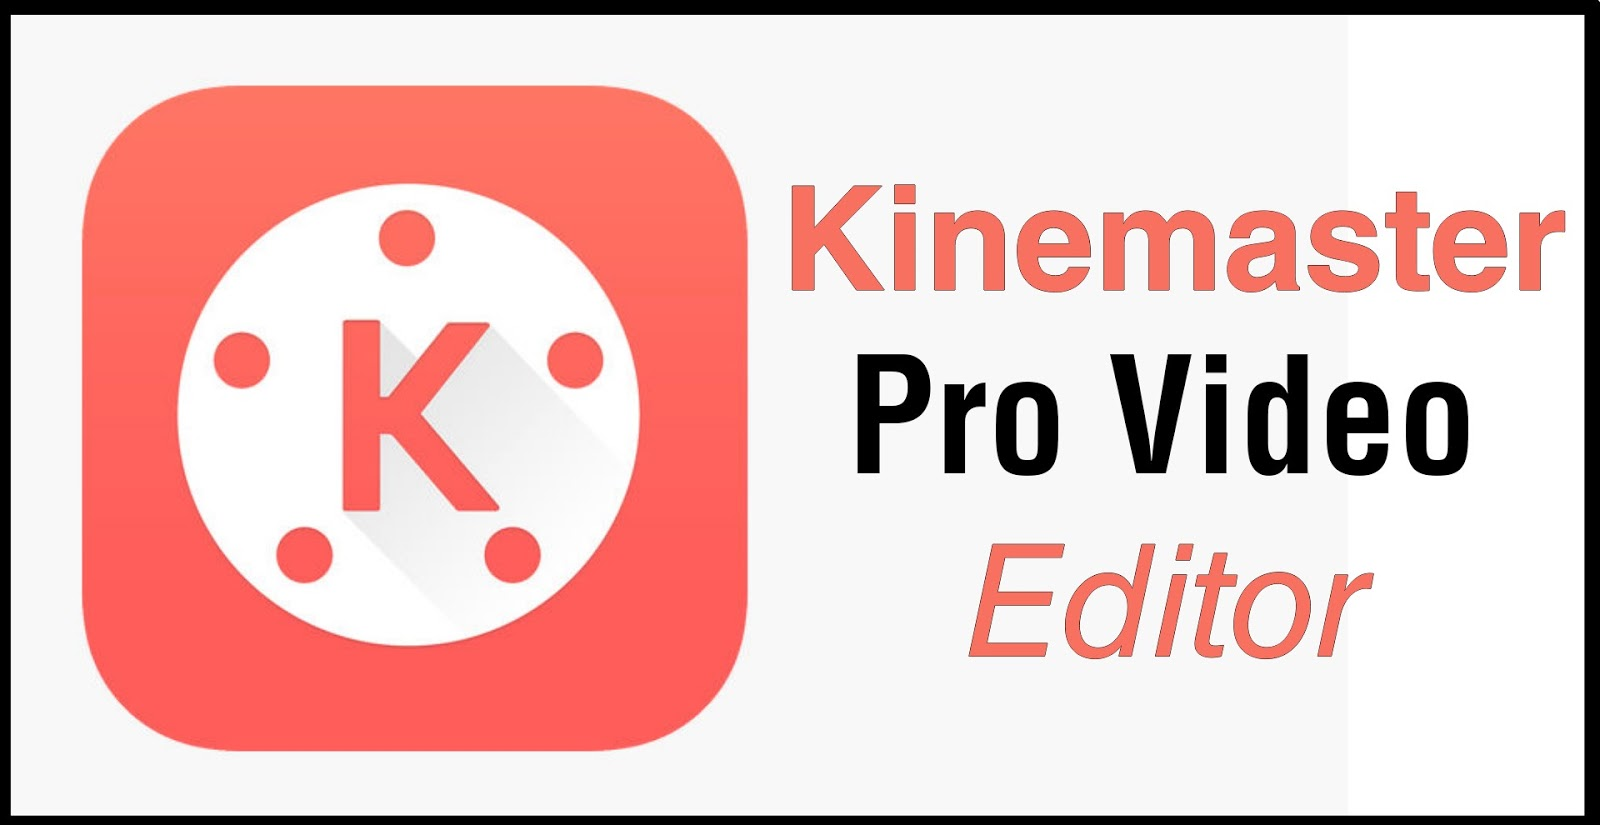 Kinemaster - Pro Video Editor App